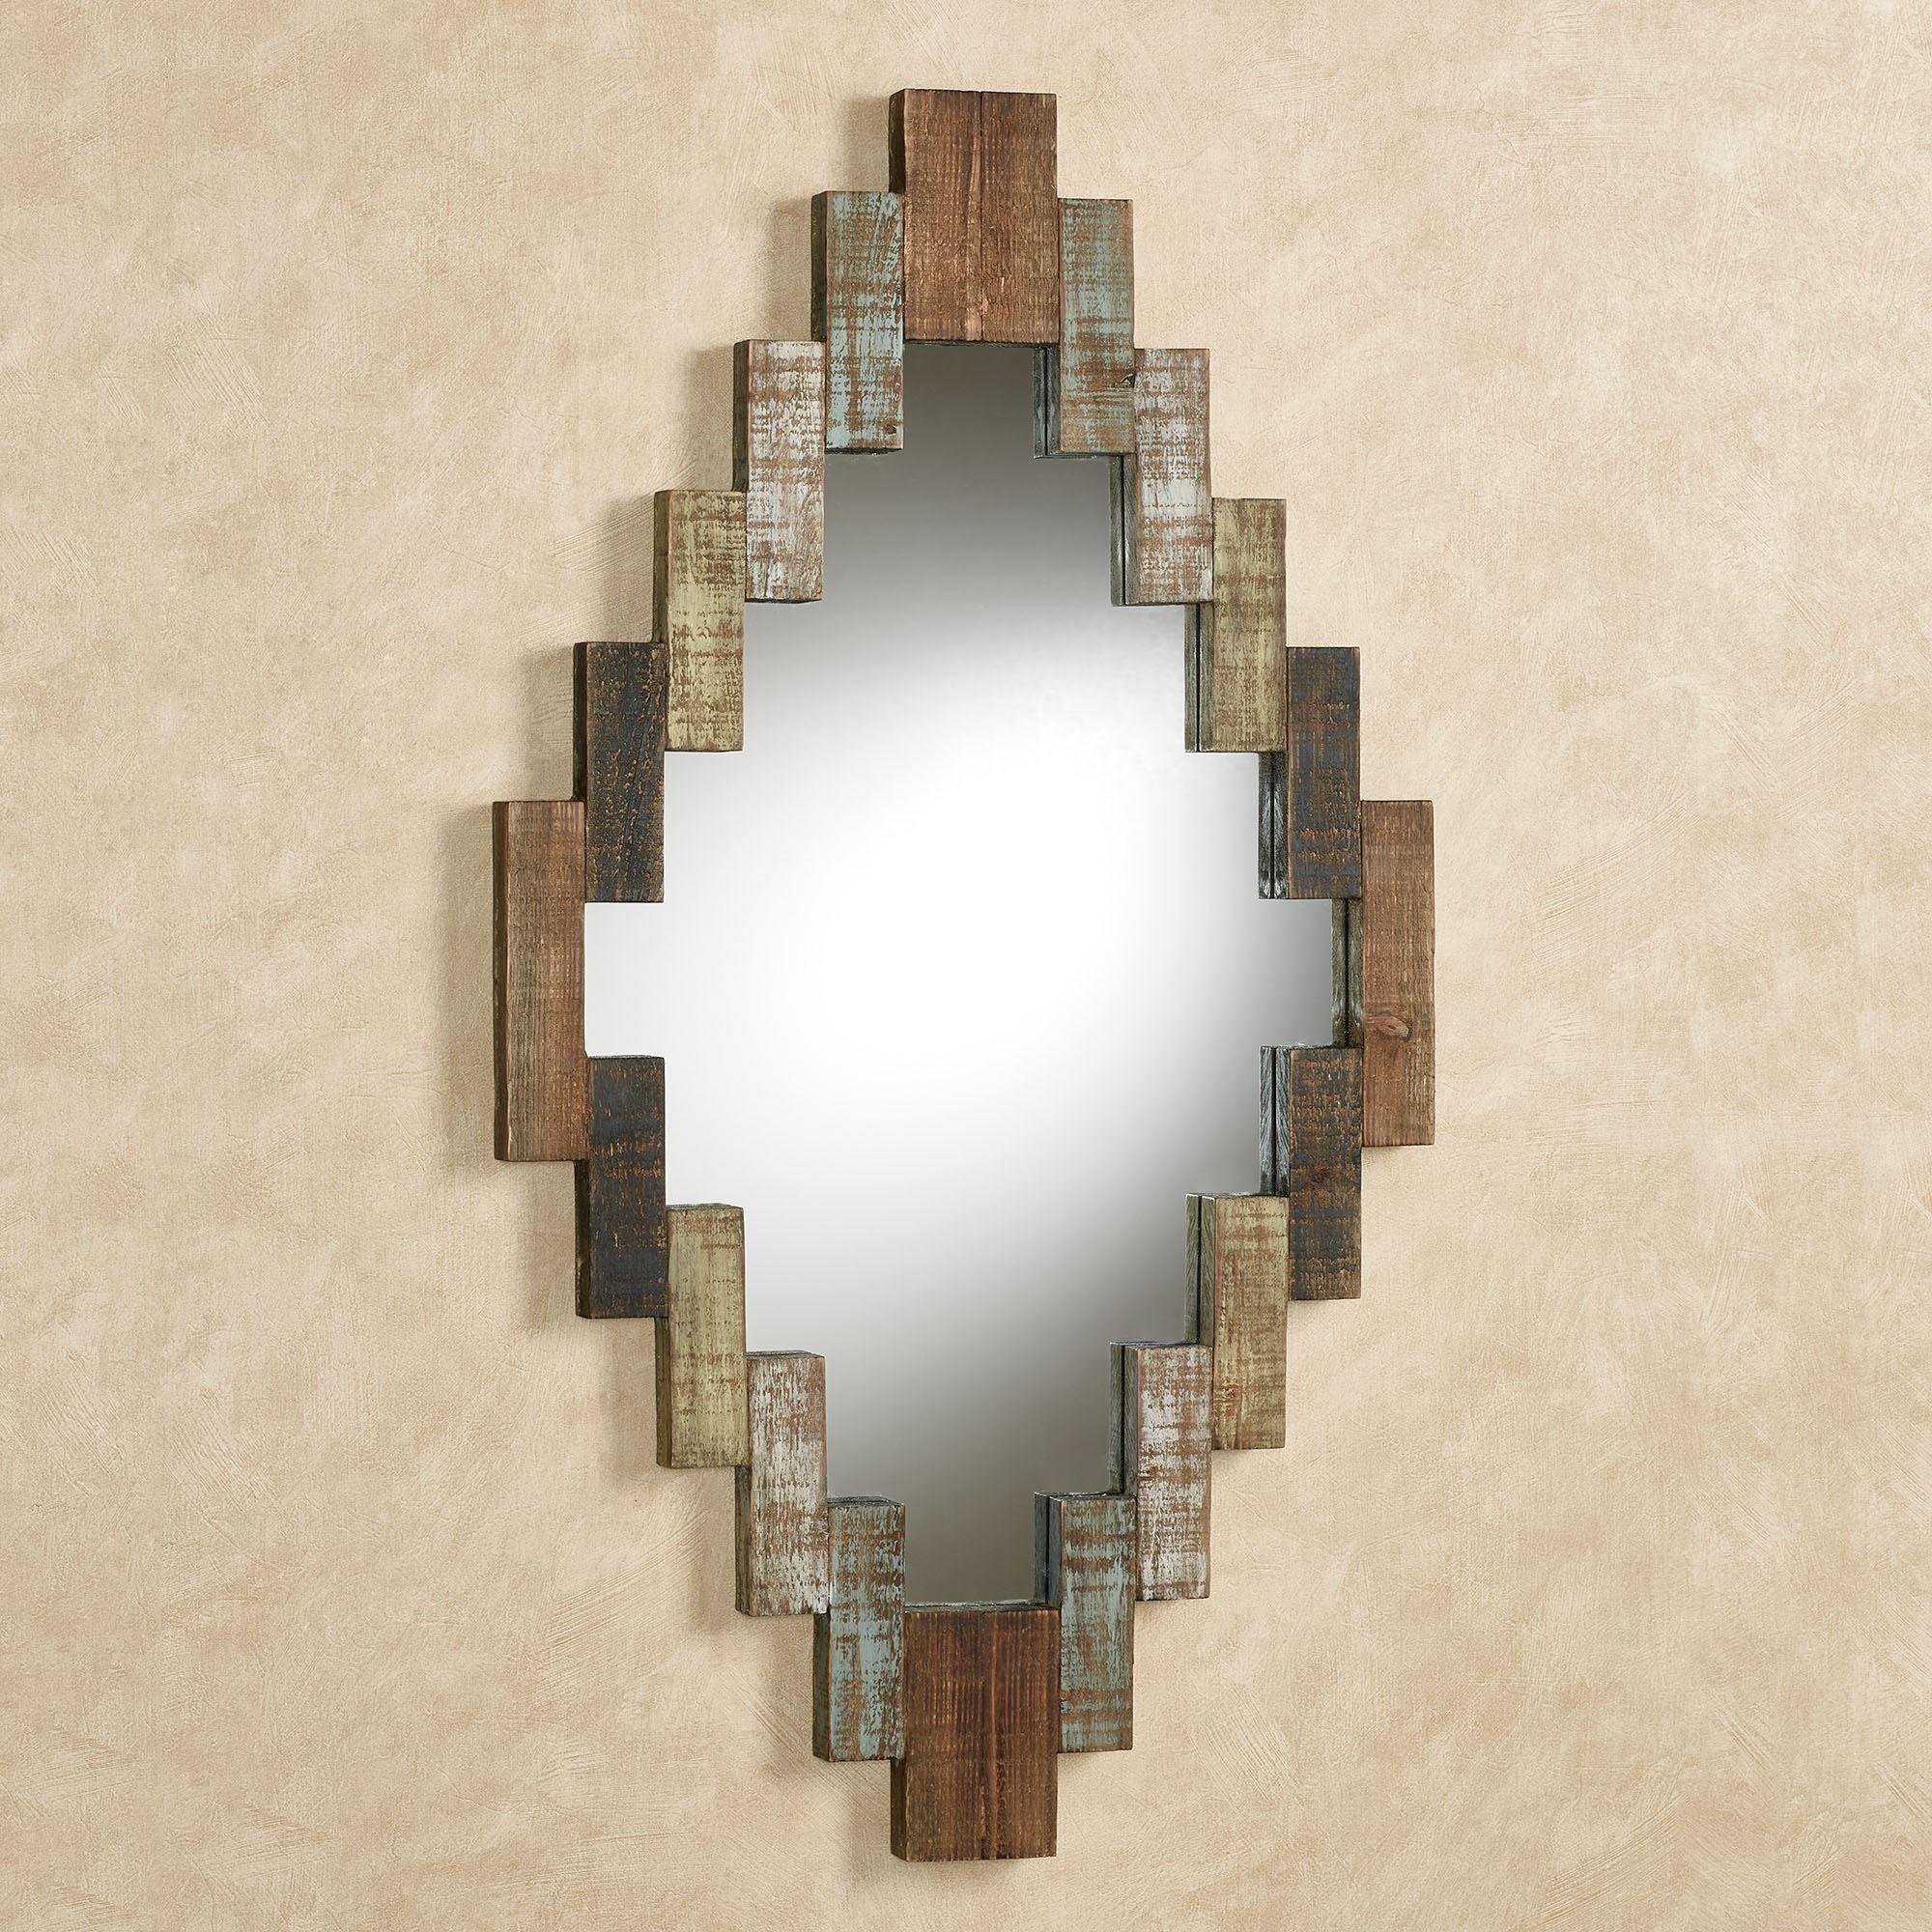 Canyon Reflections Diamond Shaped Rustic Wall Mirror